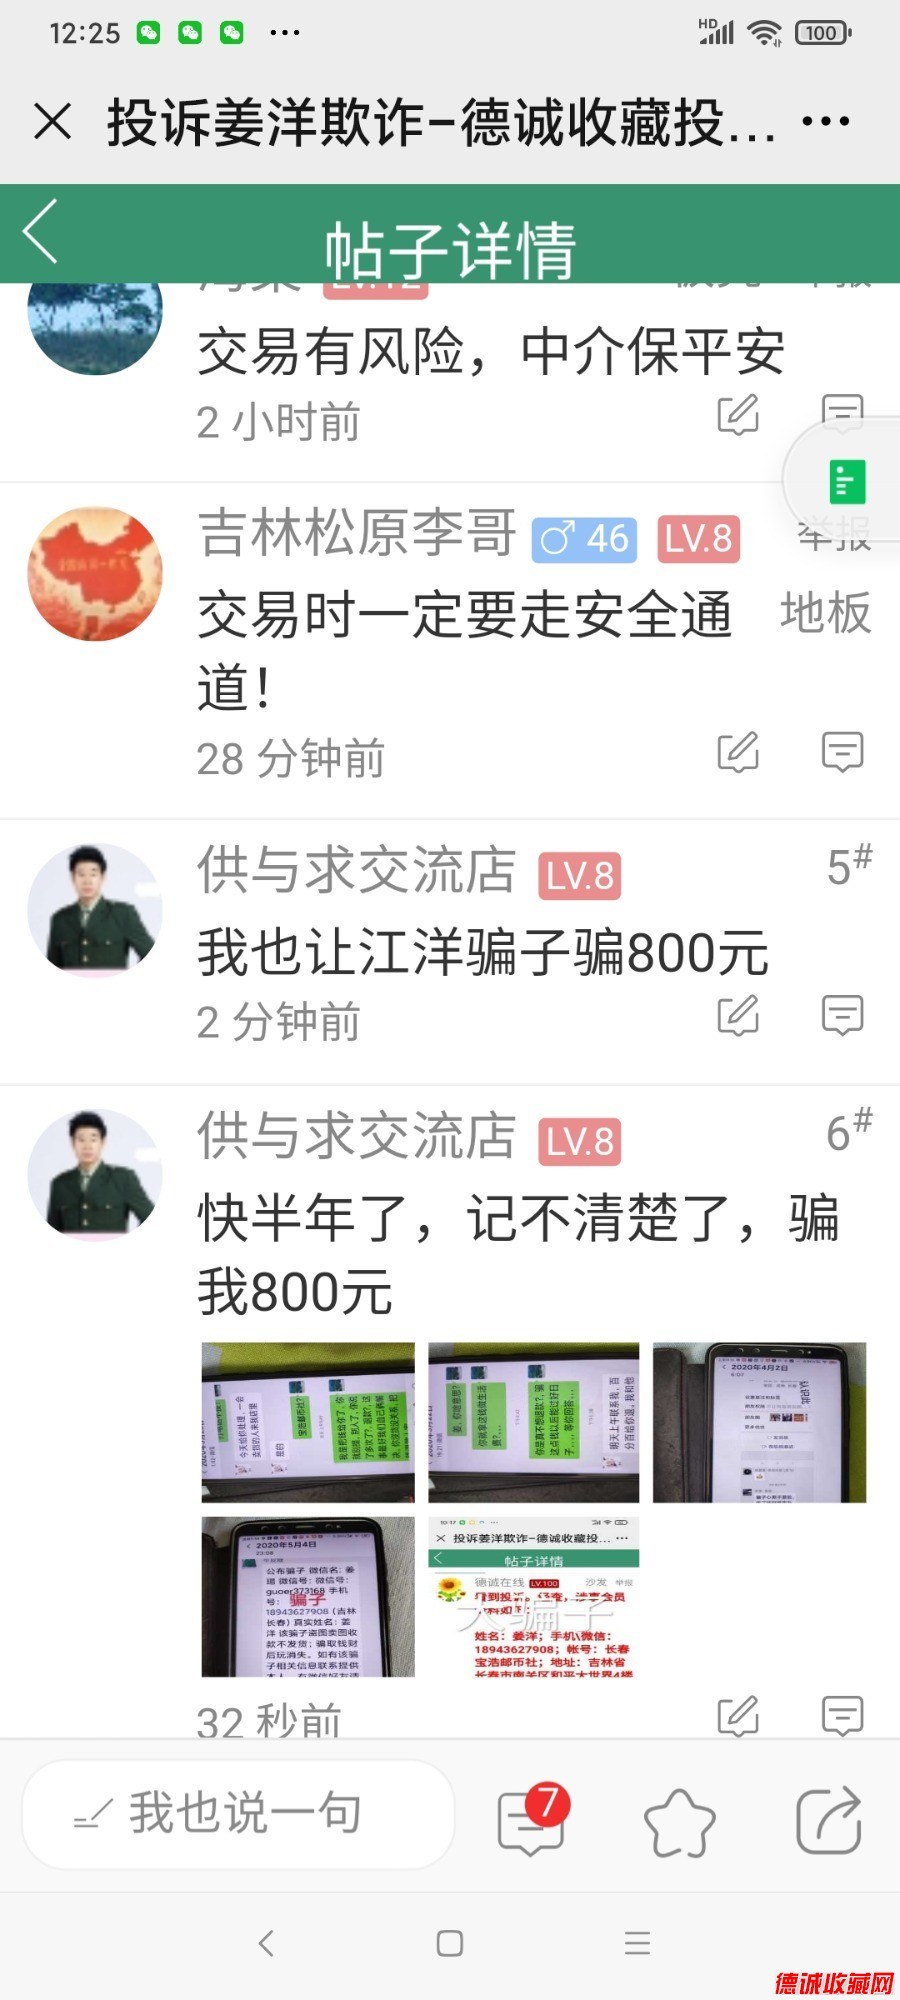 Screenshot_2020-07-17-12-25-20-709_com.tencent.mm.jpg